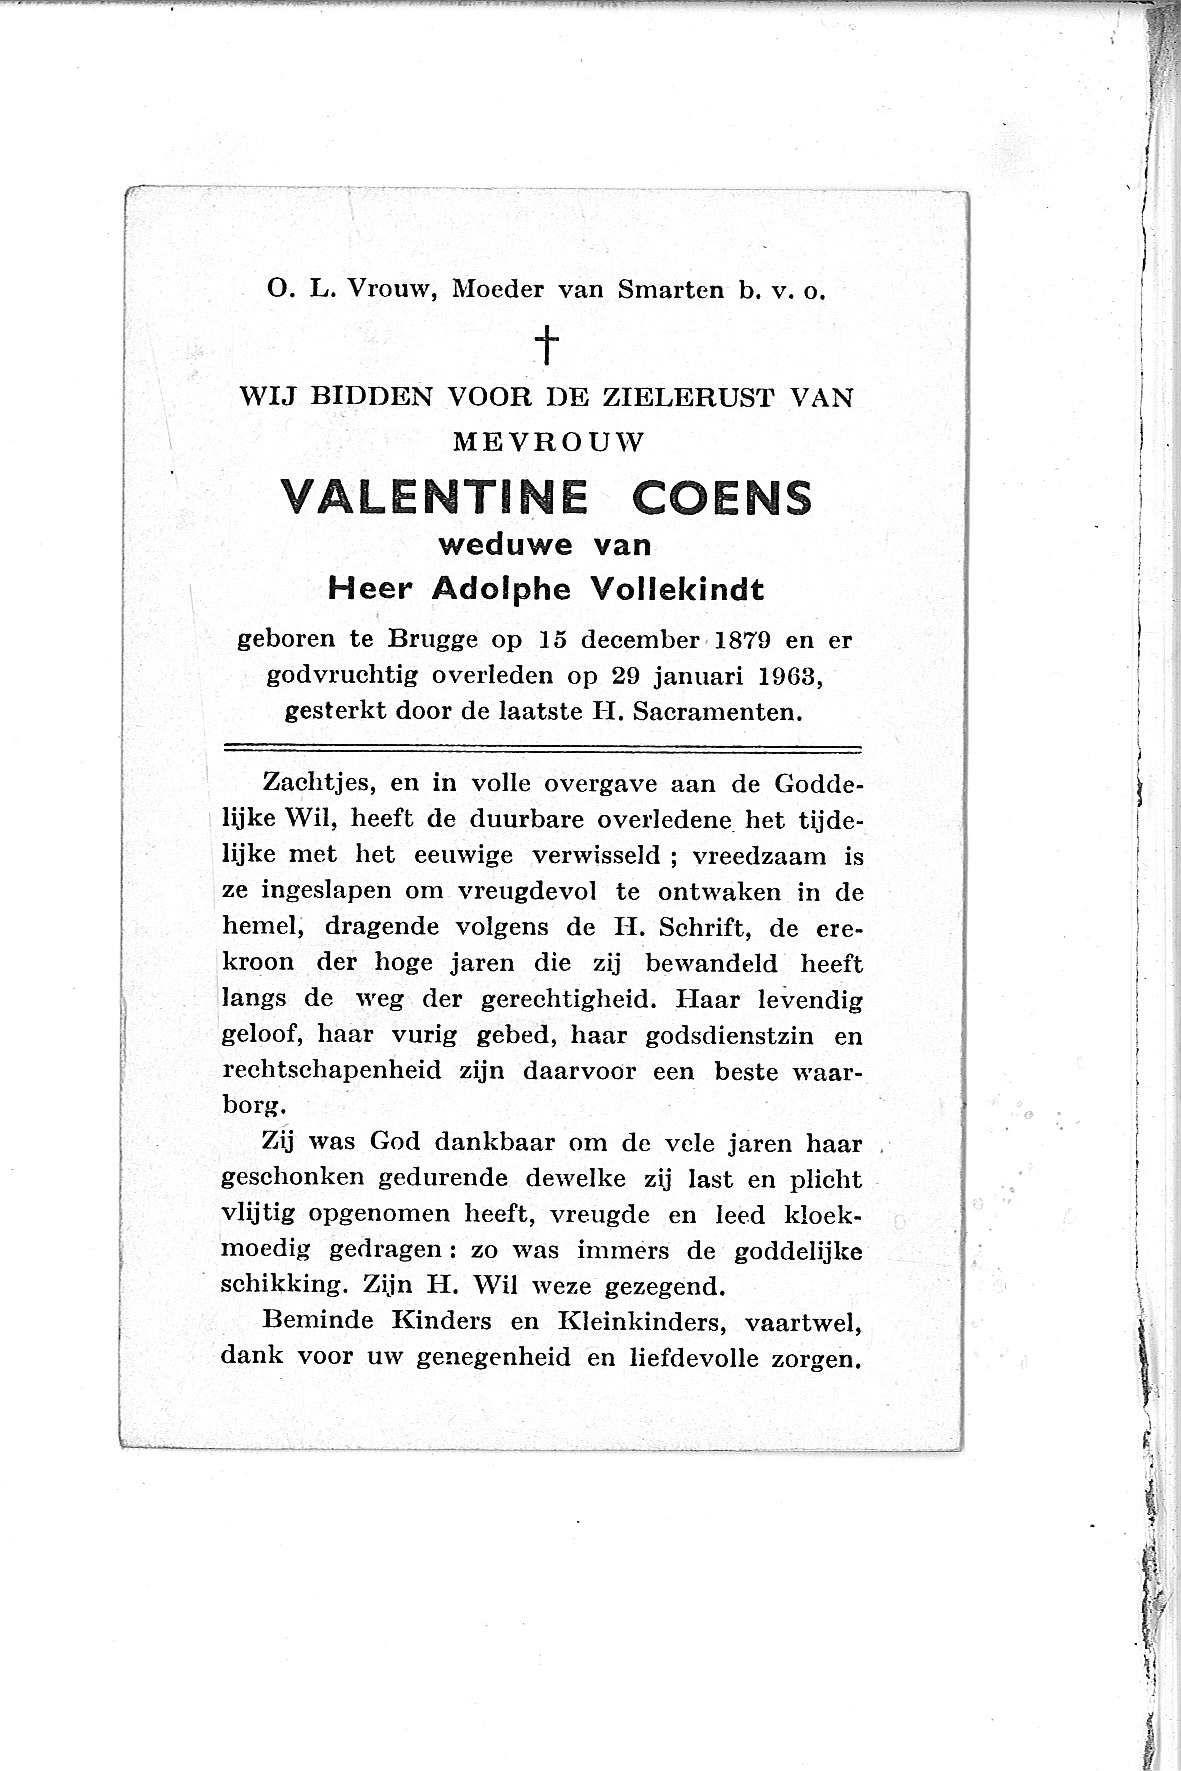 Valentine (1903) 20111024083155_00169.jpg